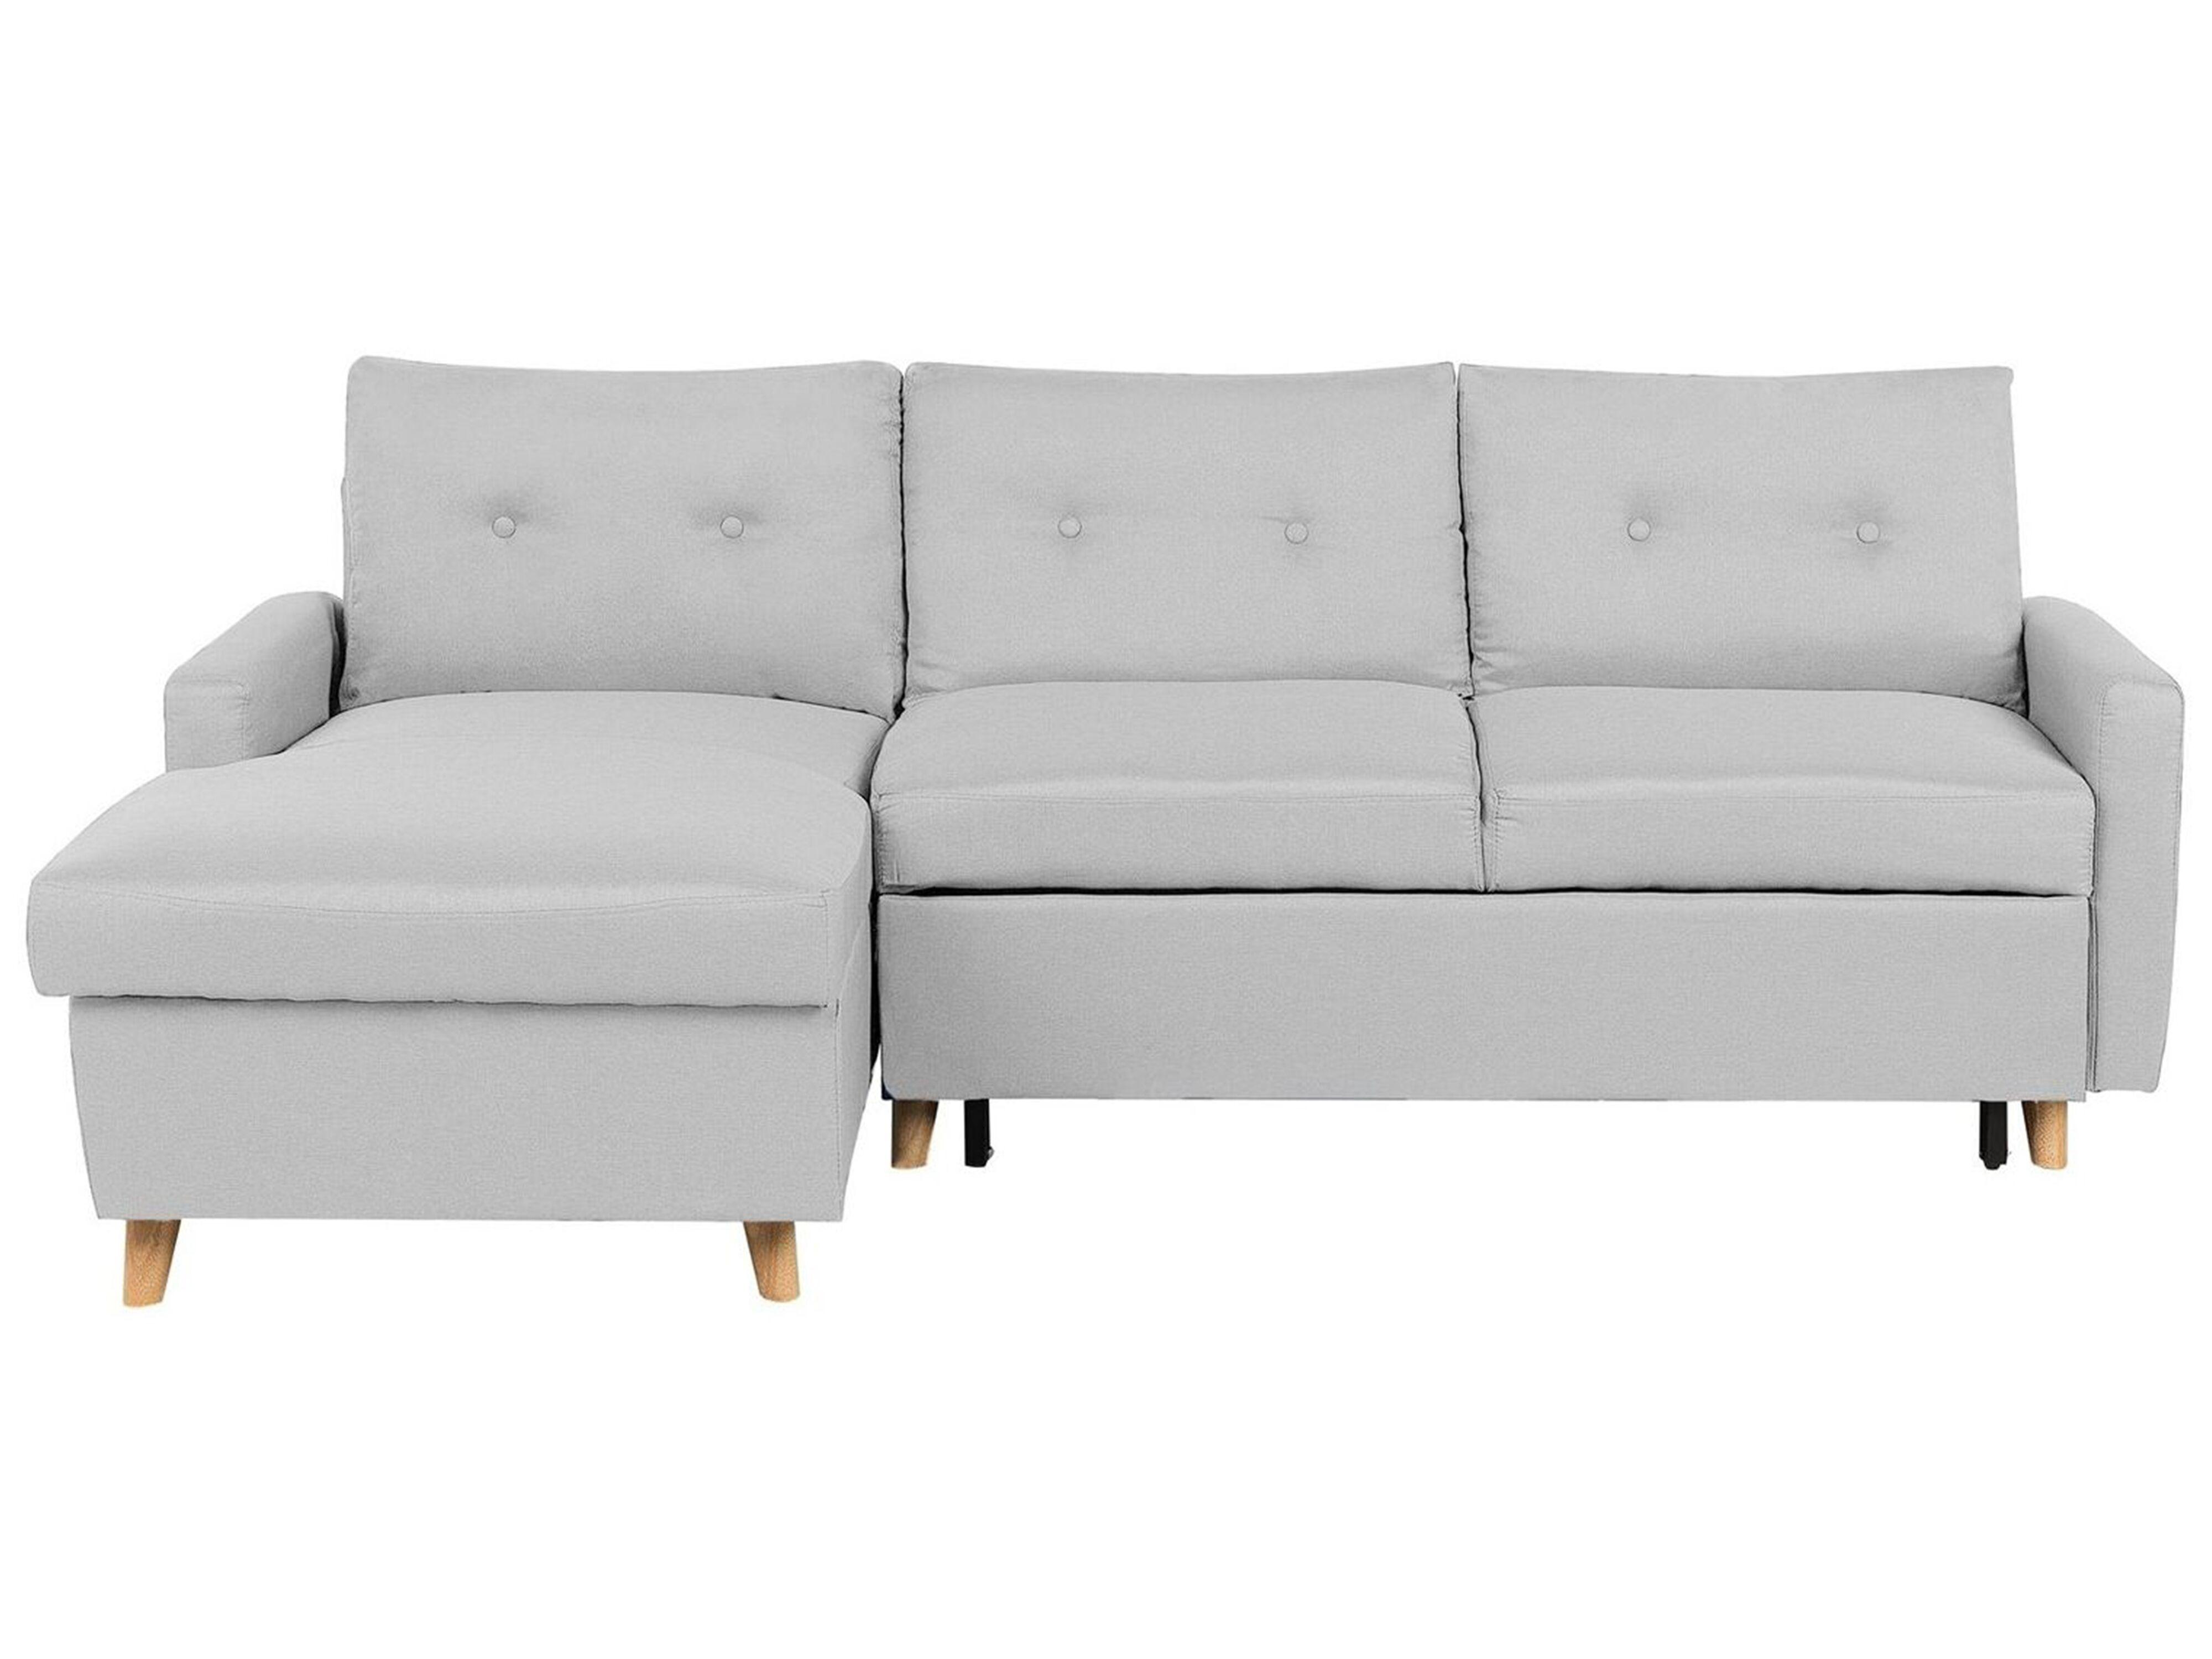 sofa flakk polsterbezug hellgrau rechtsseitig ch